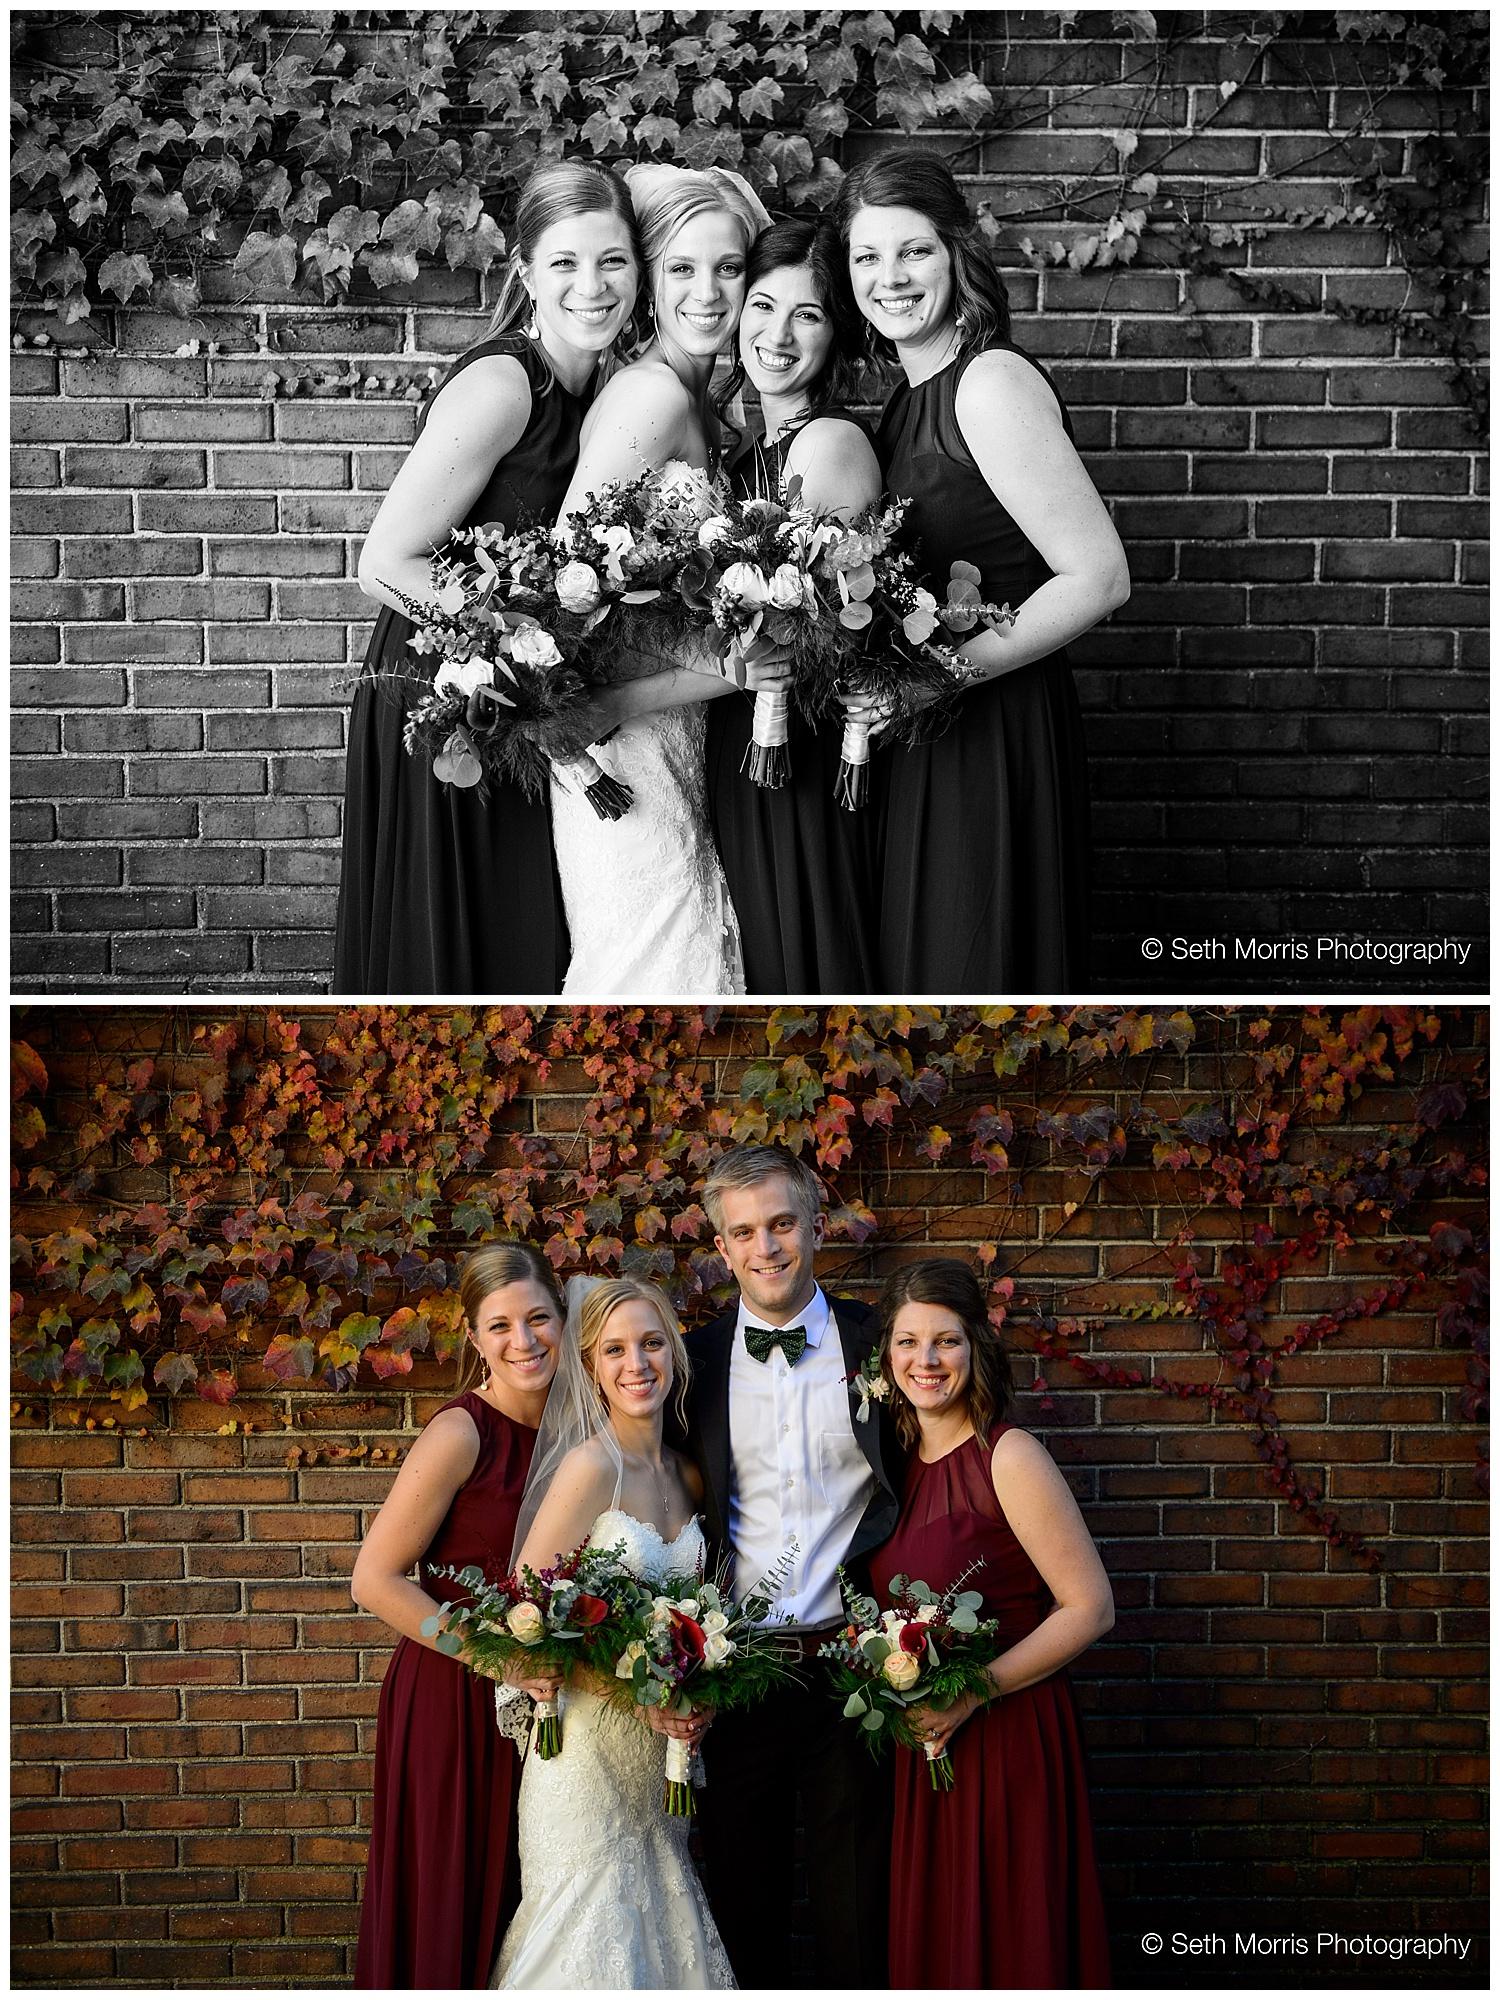 fall-wedding-ottawa-illinois-photographer-53.jpg